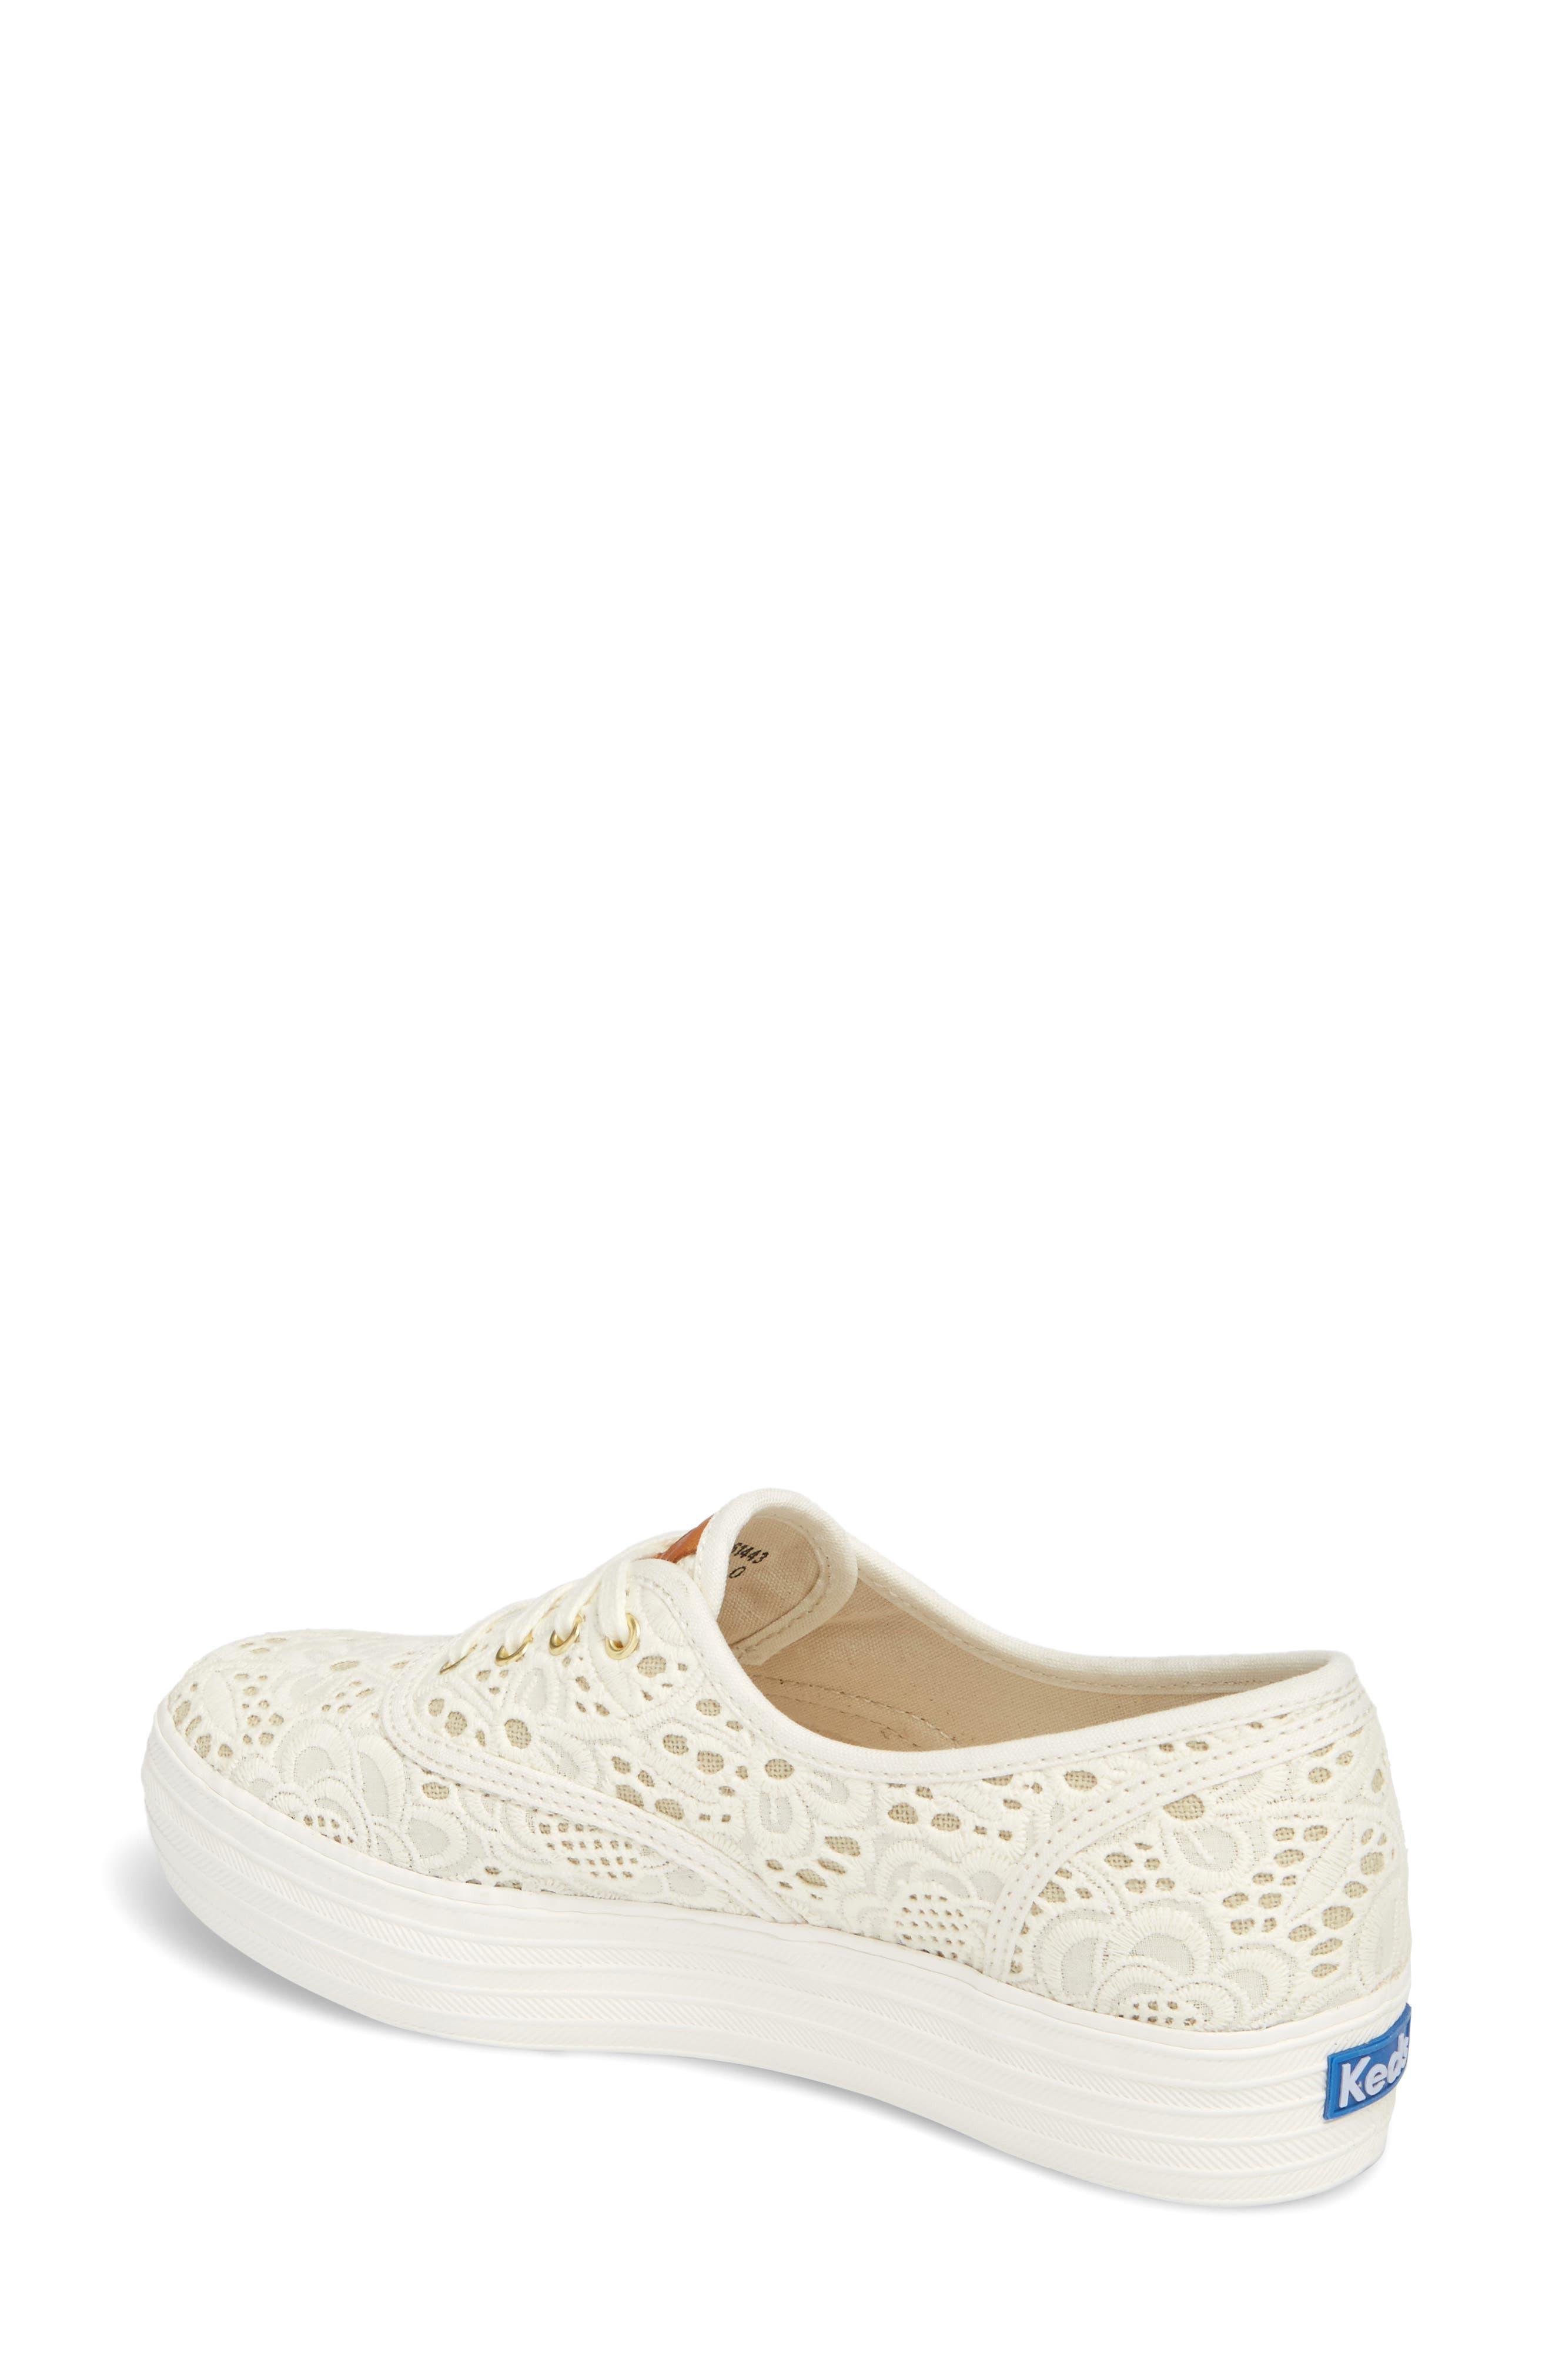 Alternate Image 2  - Keds® Triple Embroidered Crochet Platform Sneaker (Women)